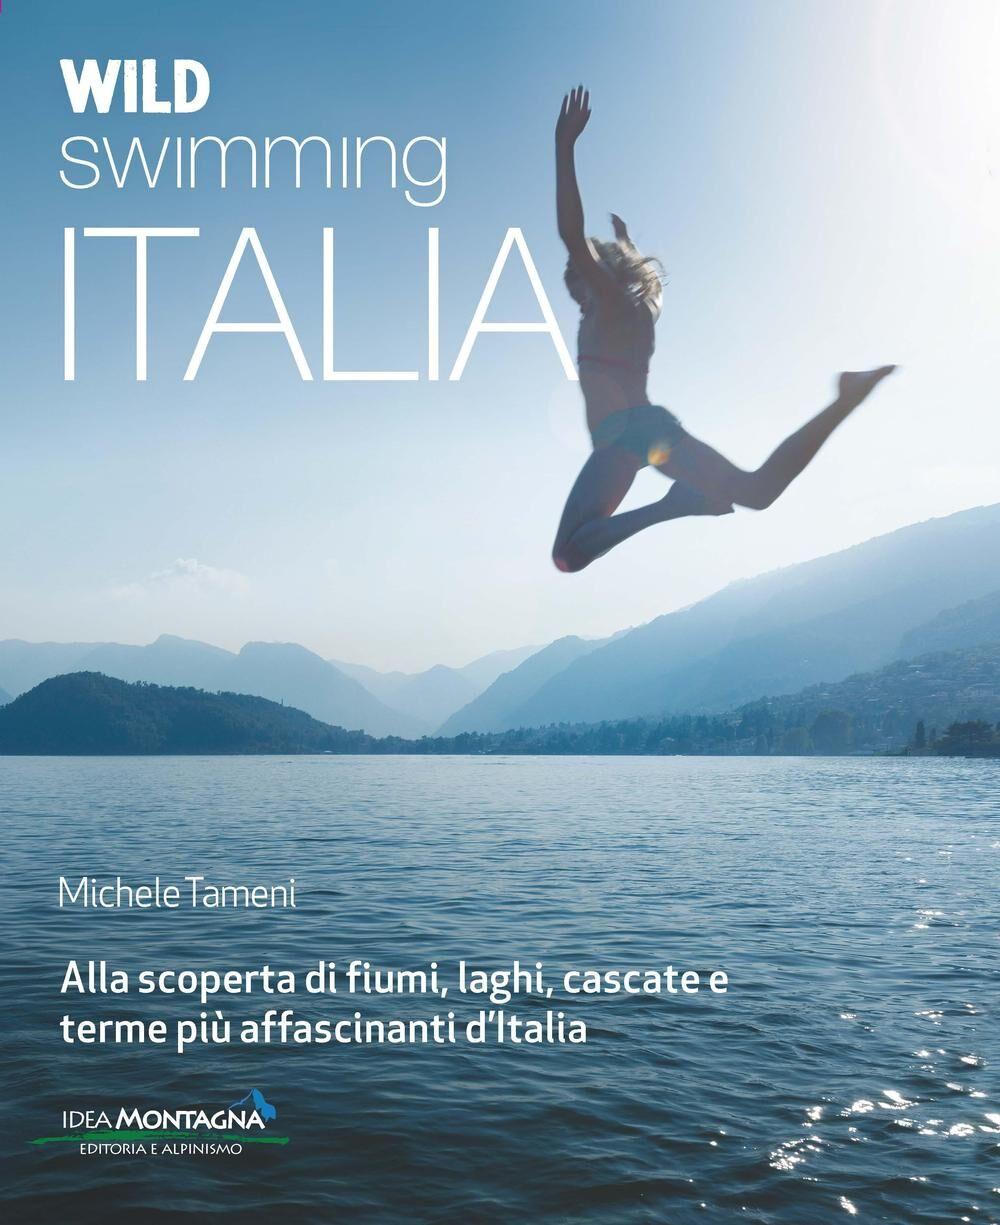 Wild swimming Italia. I fiumi, i laghi, le cascate e le terme più affascinanti d'Italia